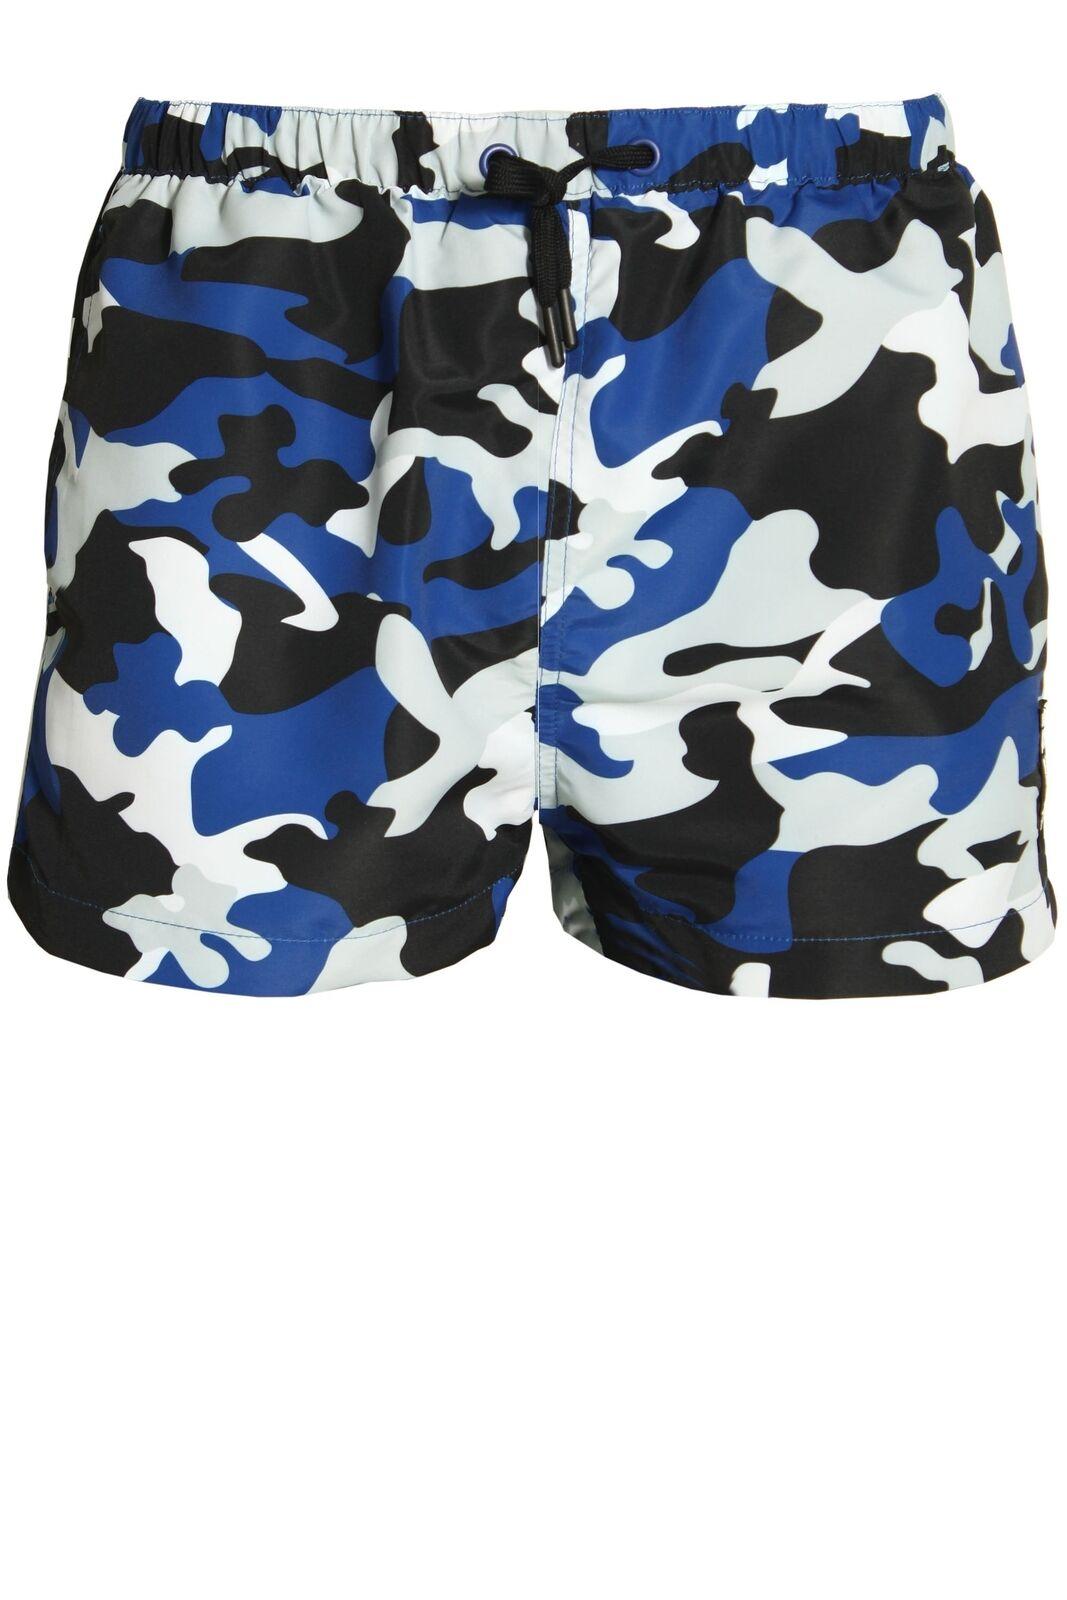 Mens Swimwear ELLESSE Viale Mens Swim Shorts   Navy Camo